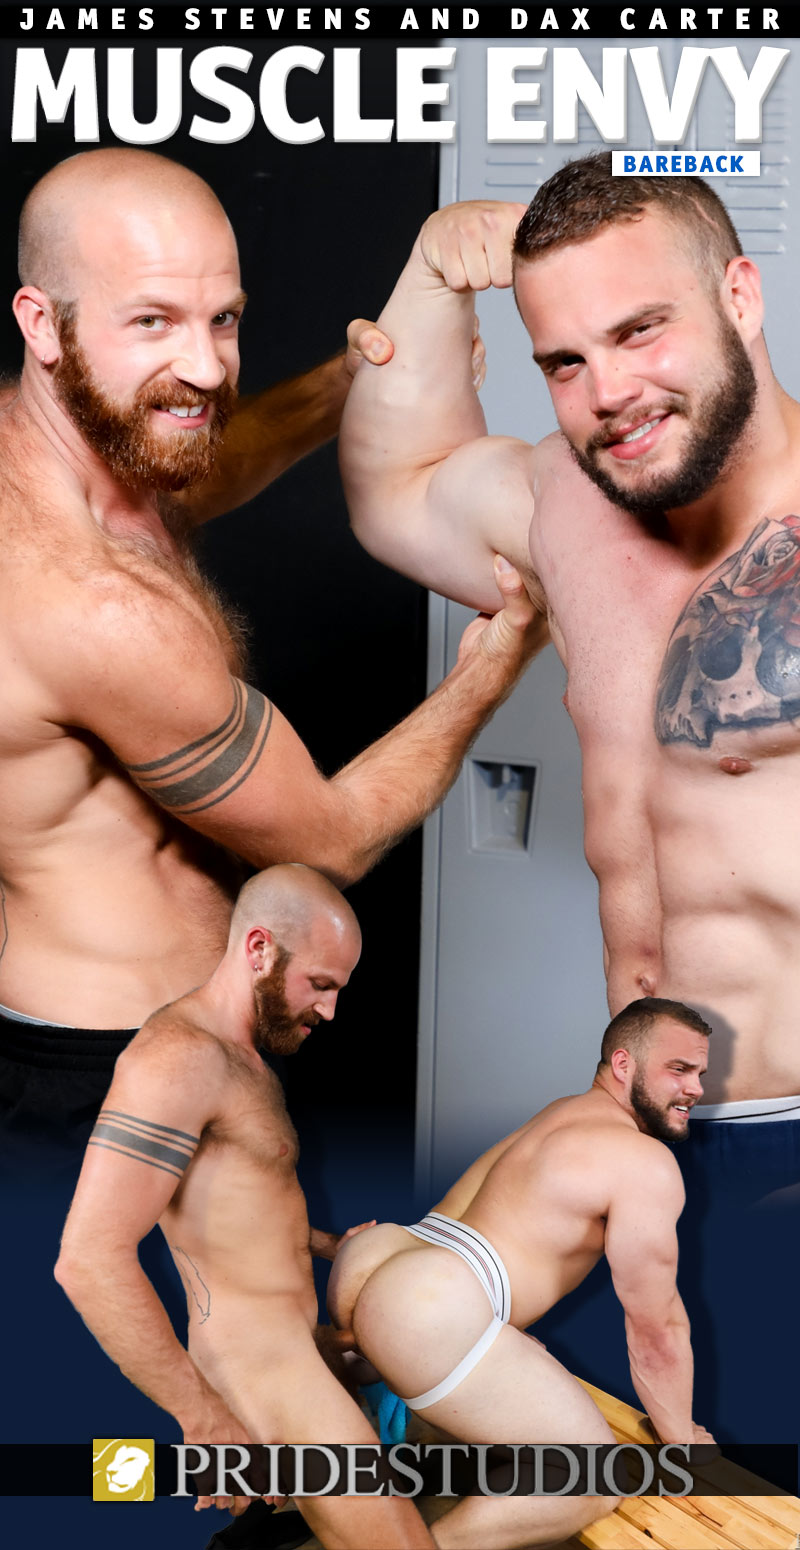 Muscle Envy (James Stevens Fucks Dax Carter) at PrideStudios